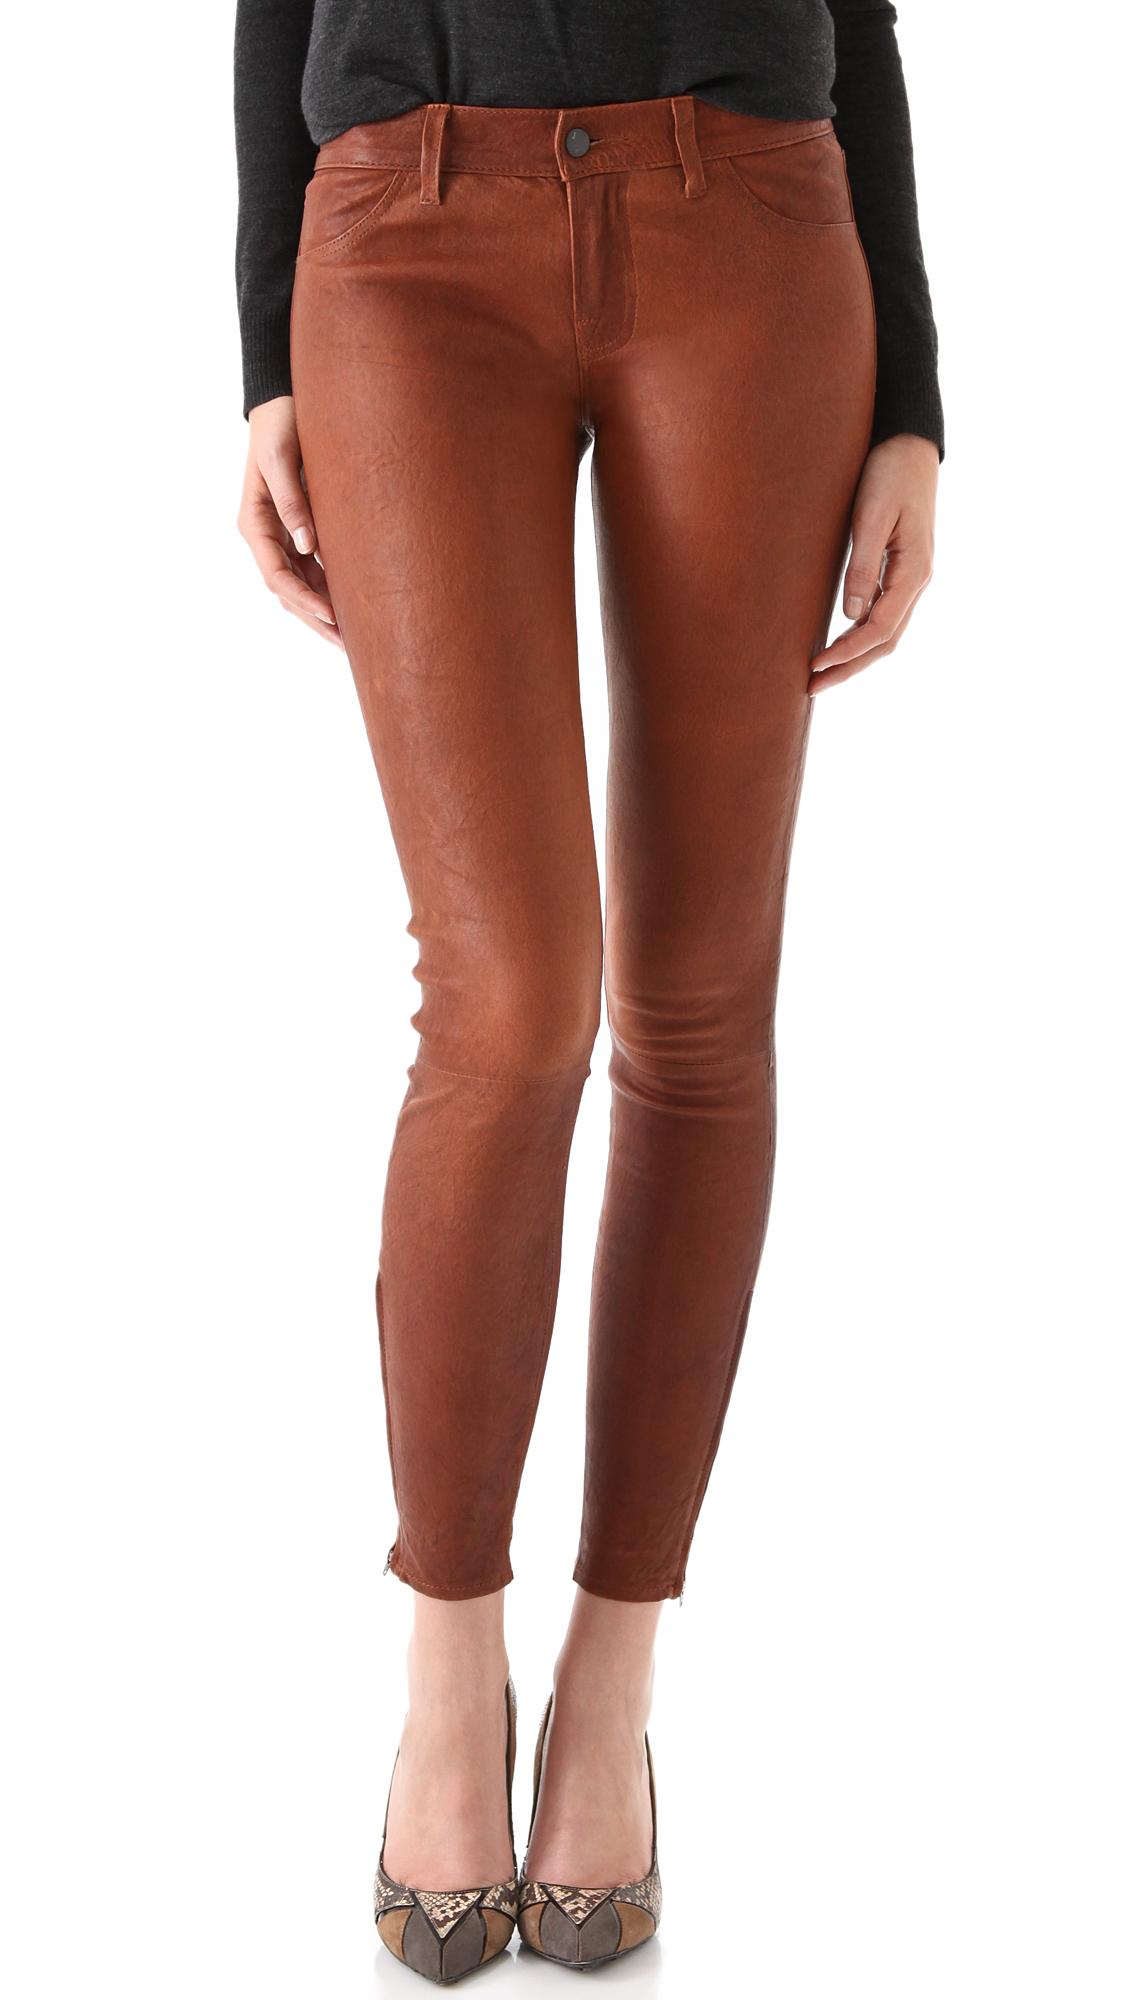 886bc4d4de6d3 J Brand Super Skinny Leather Pants